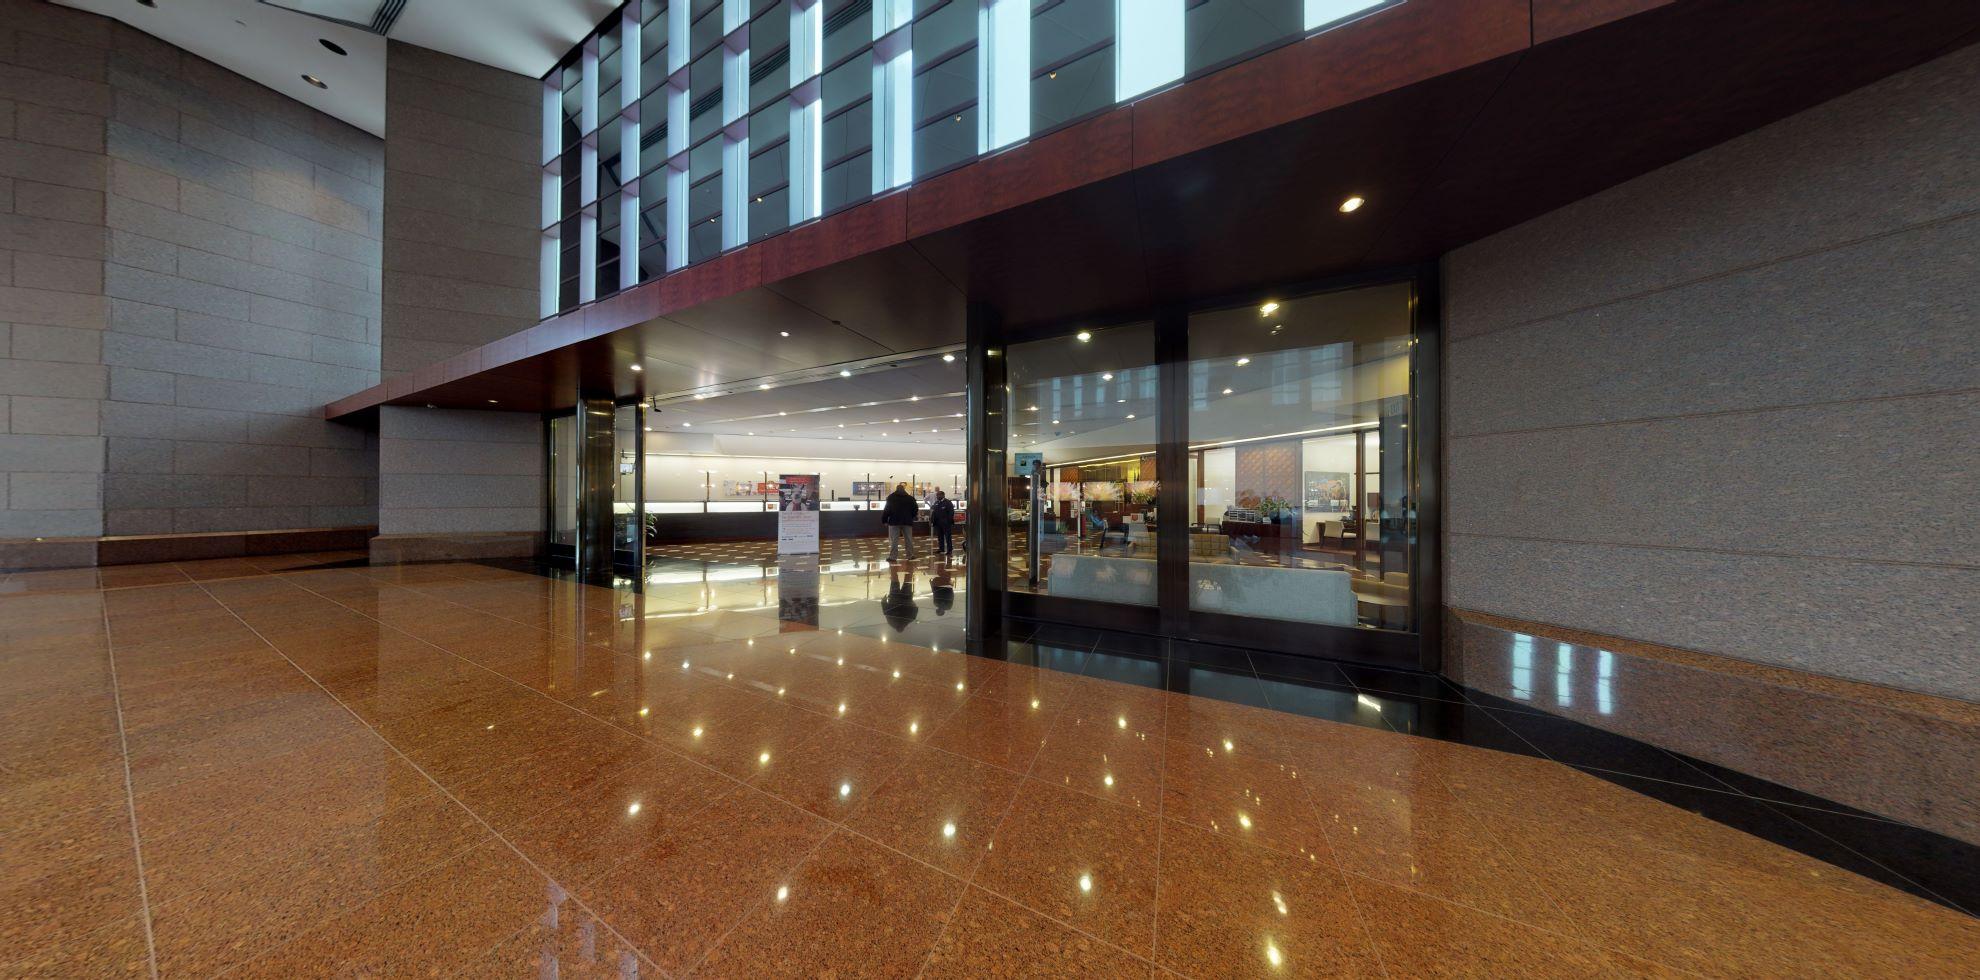 Bank of America financial center with walk-up ATM   600 Peachtree St NE, Atlanta, GA 30308